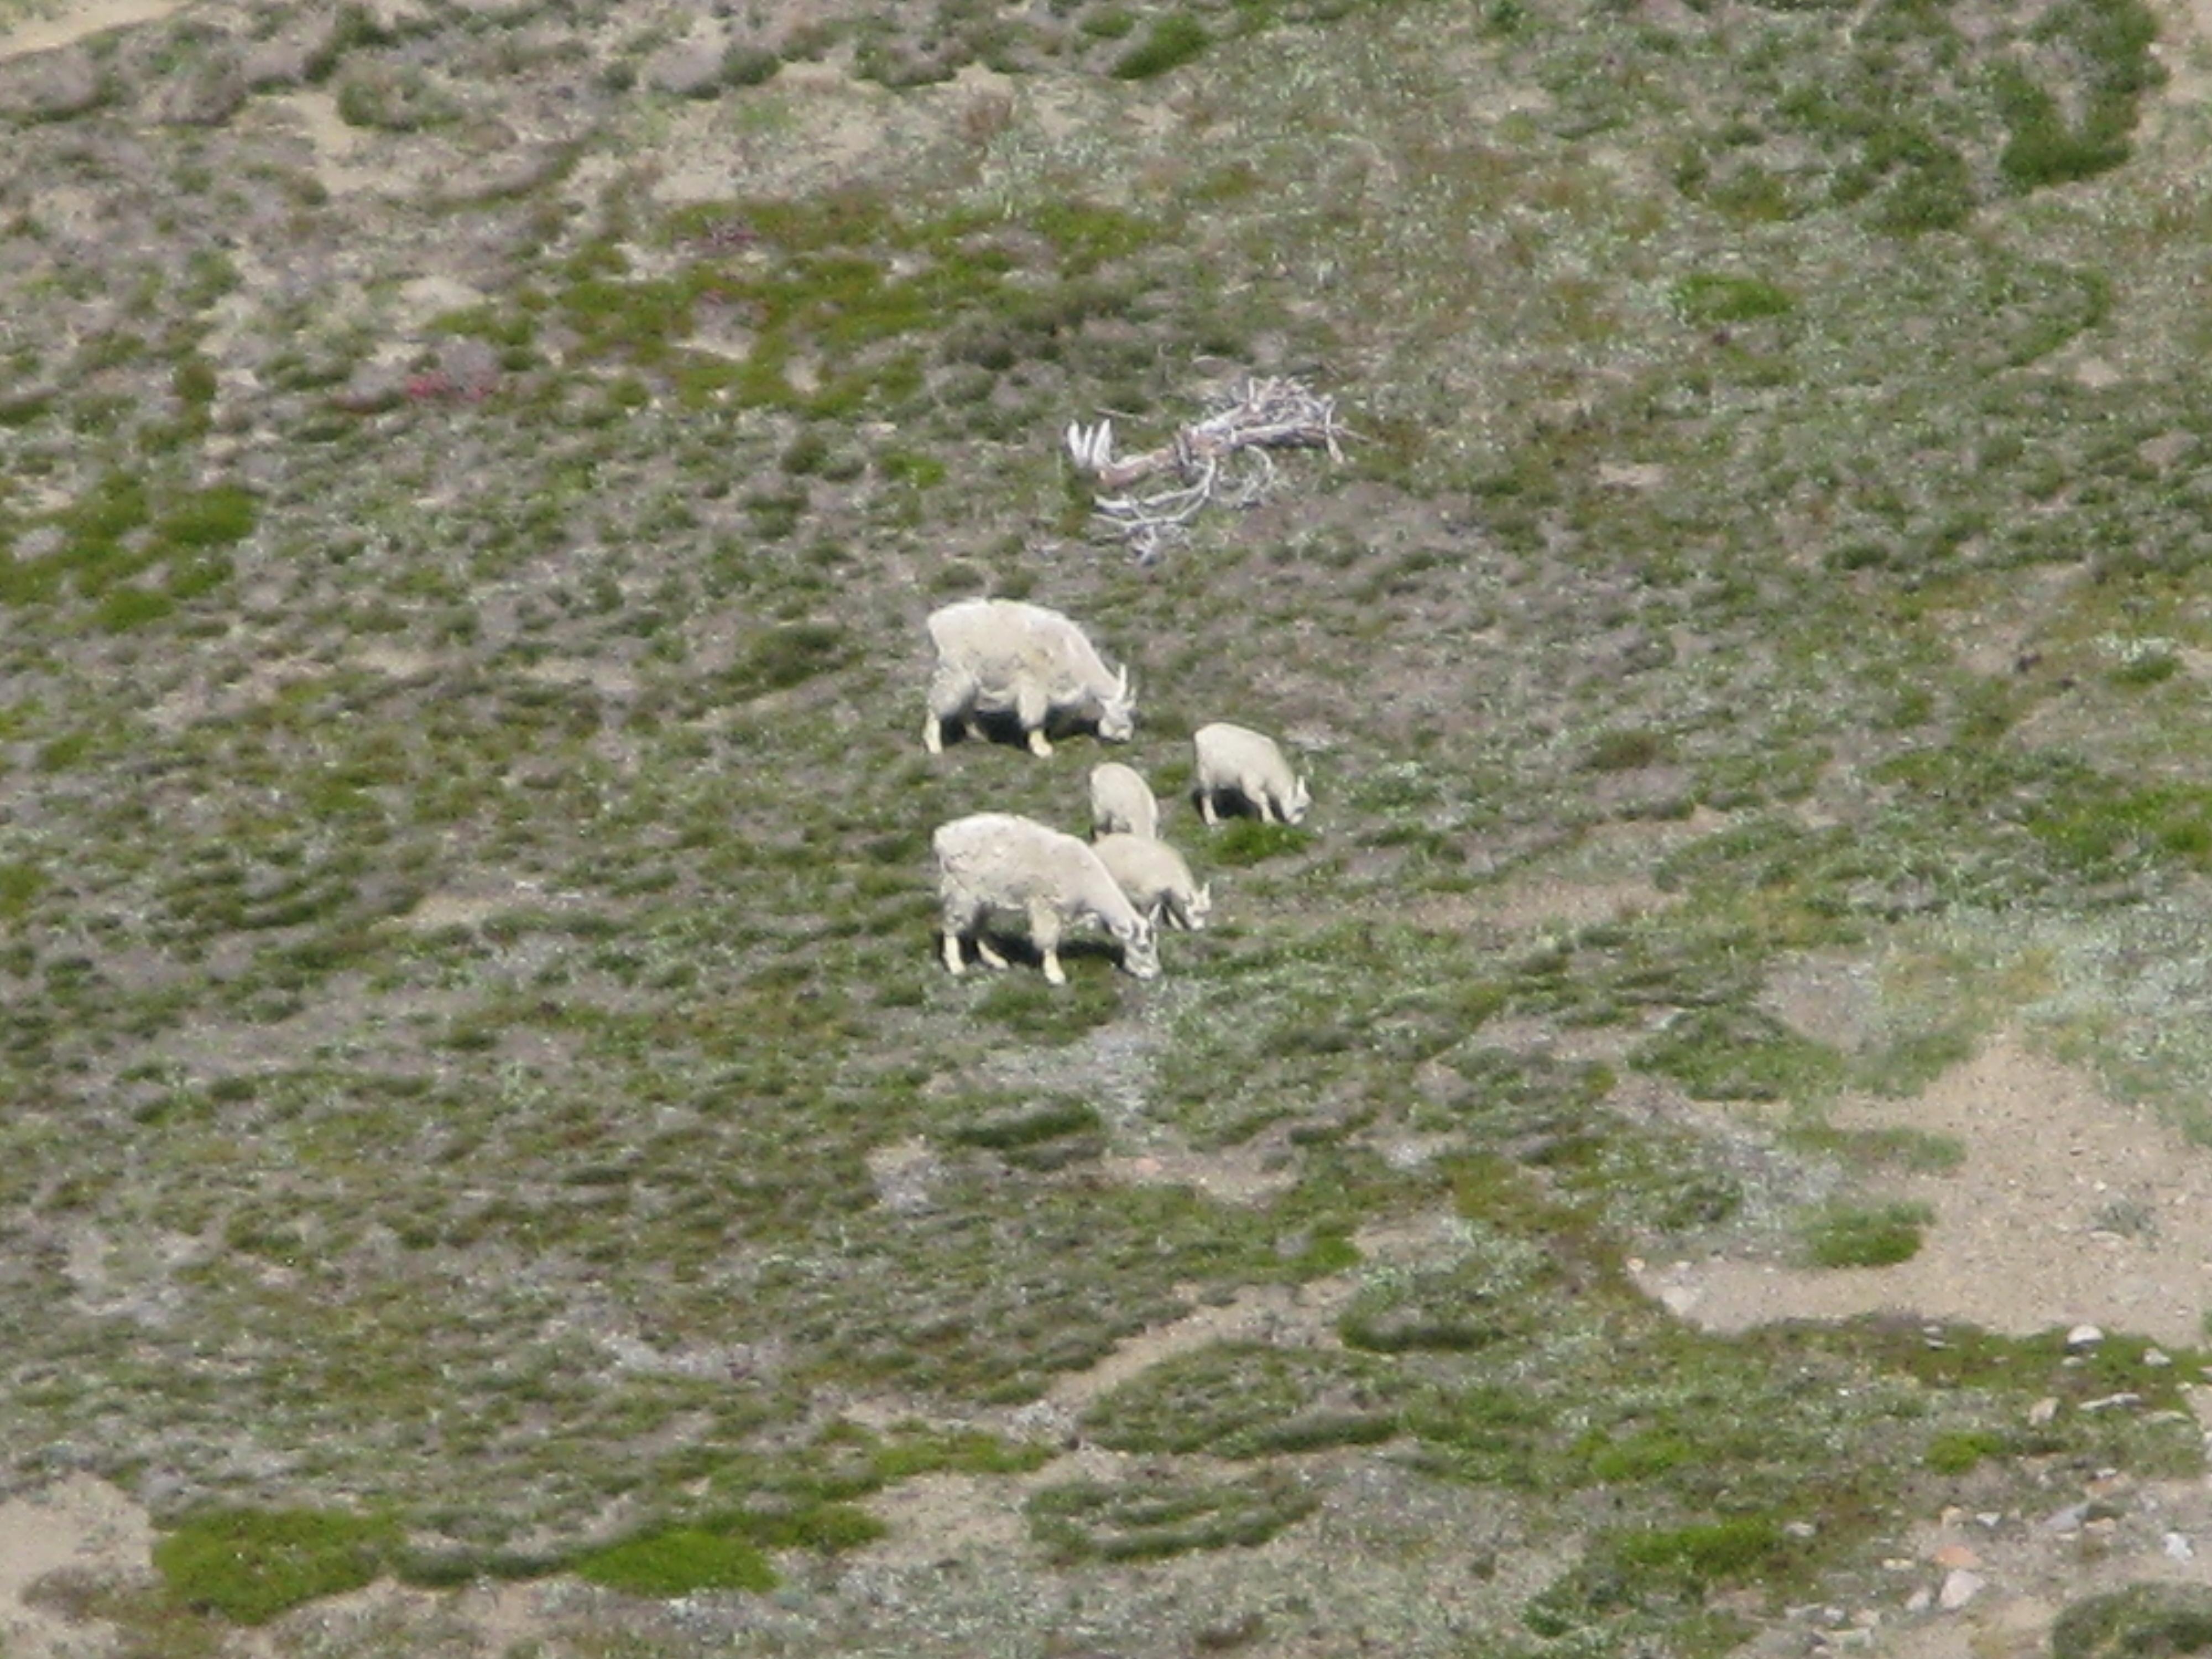 Mountain goats relaxing in the open meadow!